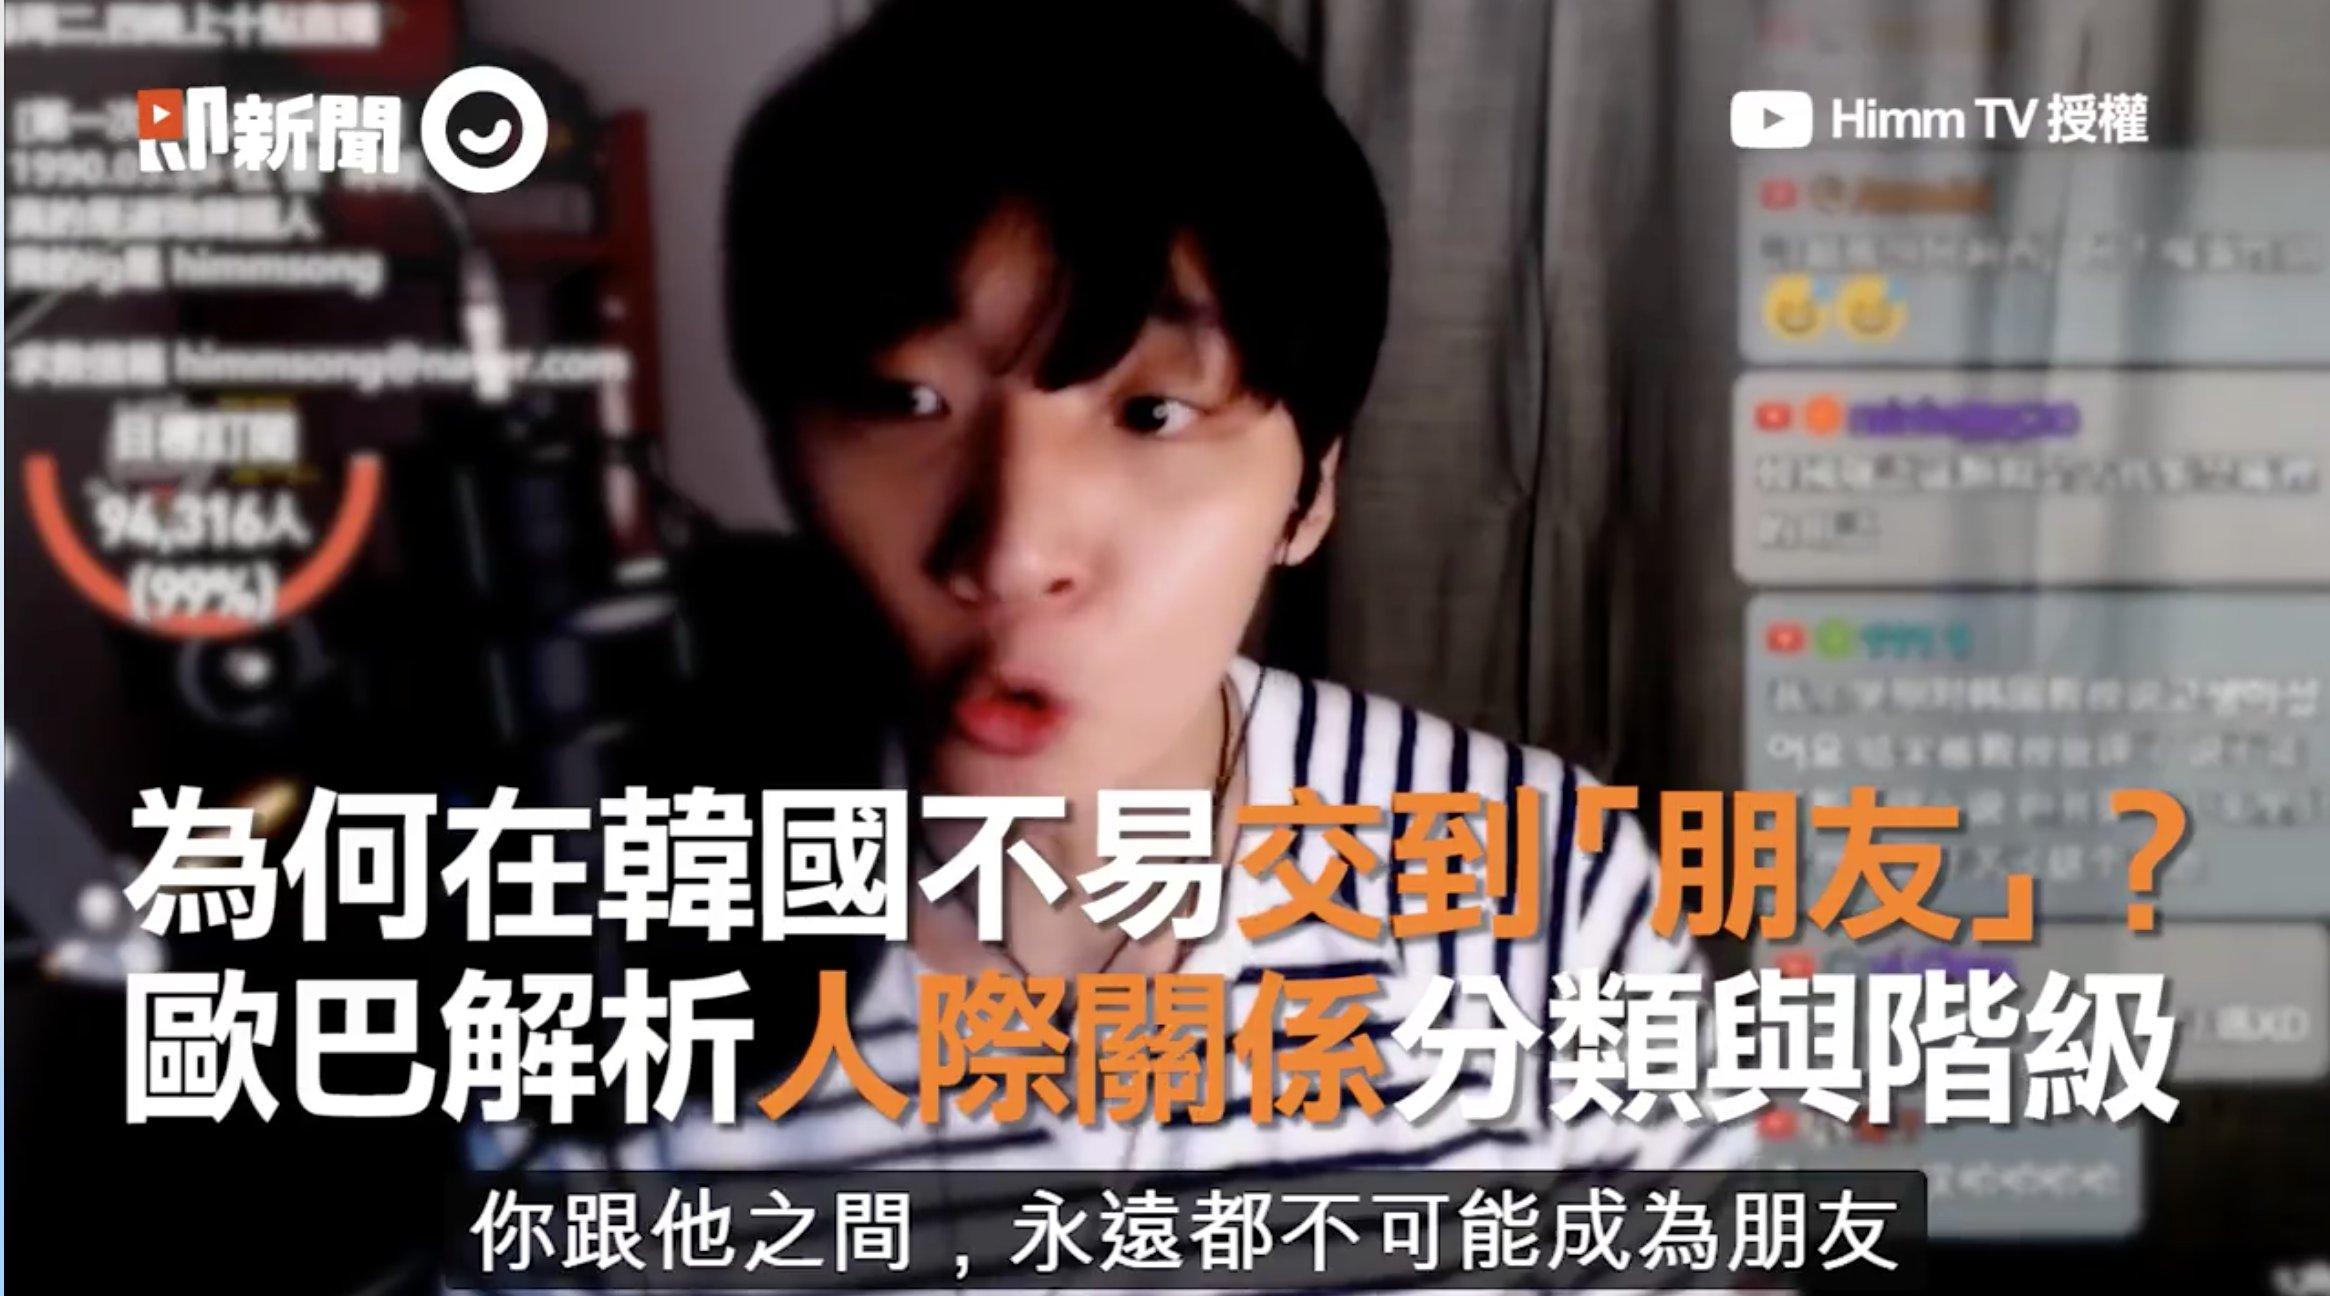 screen shot 2018 10 03 at 4 40 19 pm.png?resize=648,365 - 為何在韓國不易交到「朋友」? 歐爸解析韓國人際生態:「一句話定生死!」